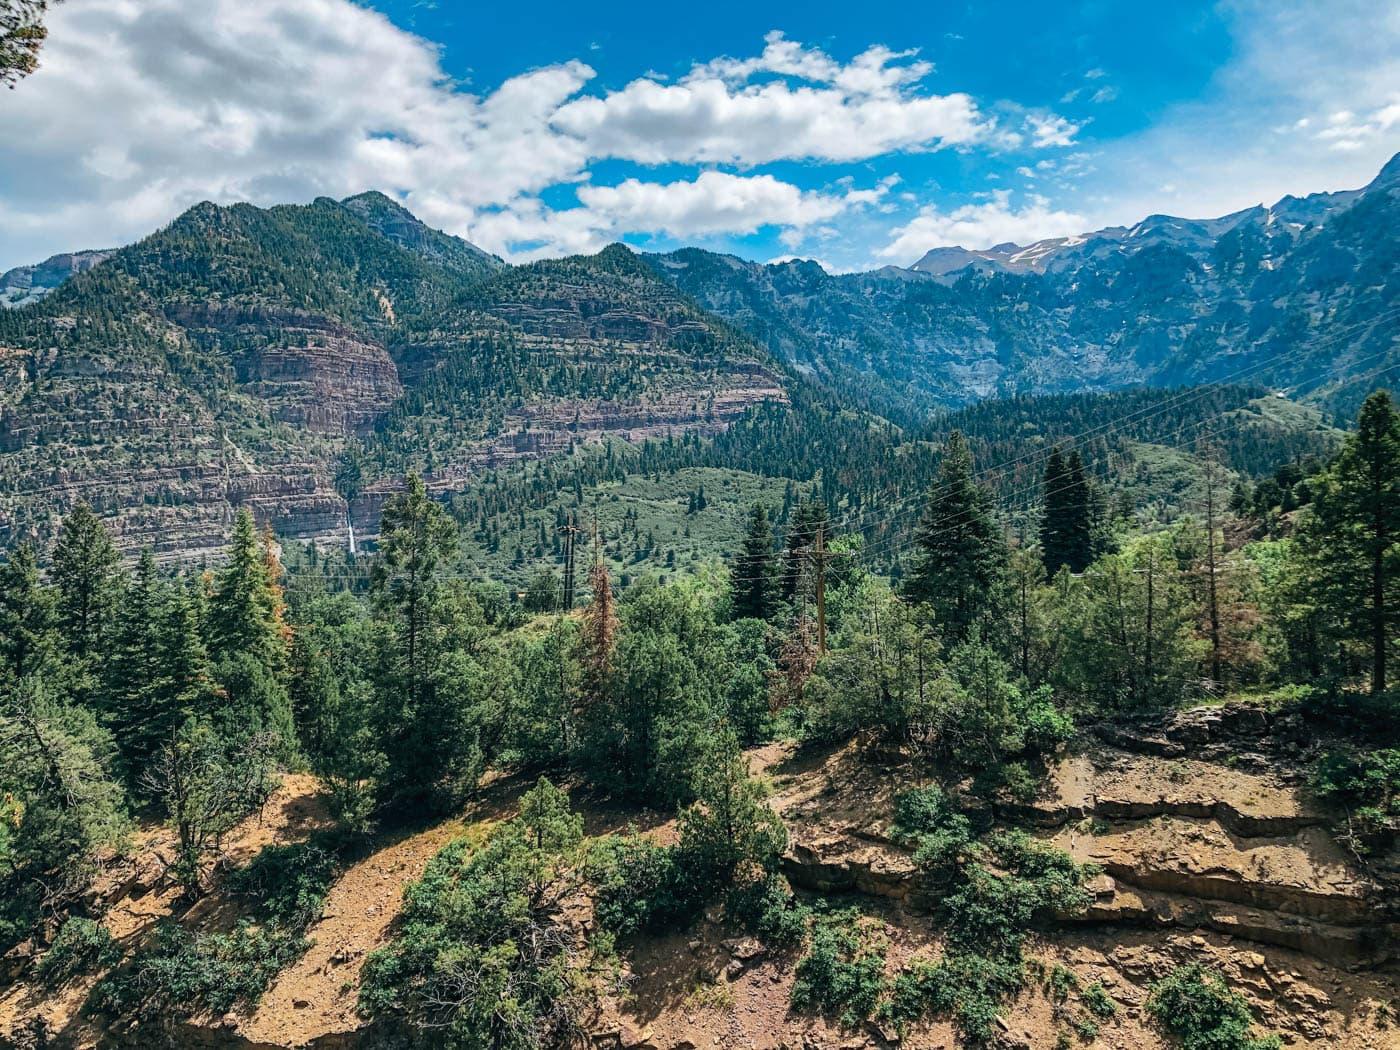 Views of the mountains around Ouray Colorado